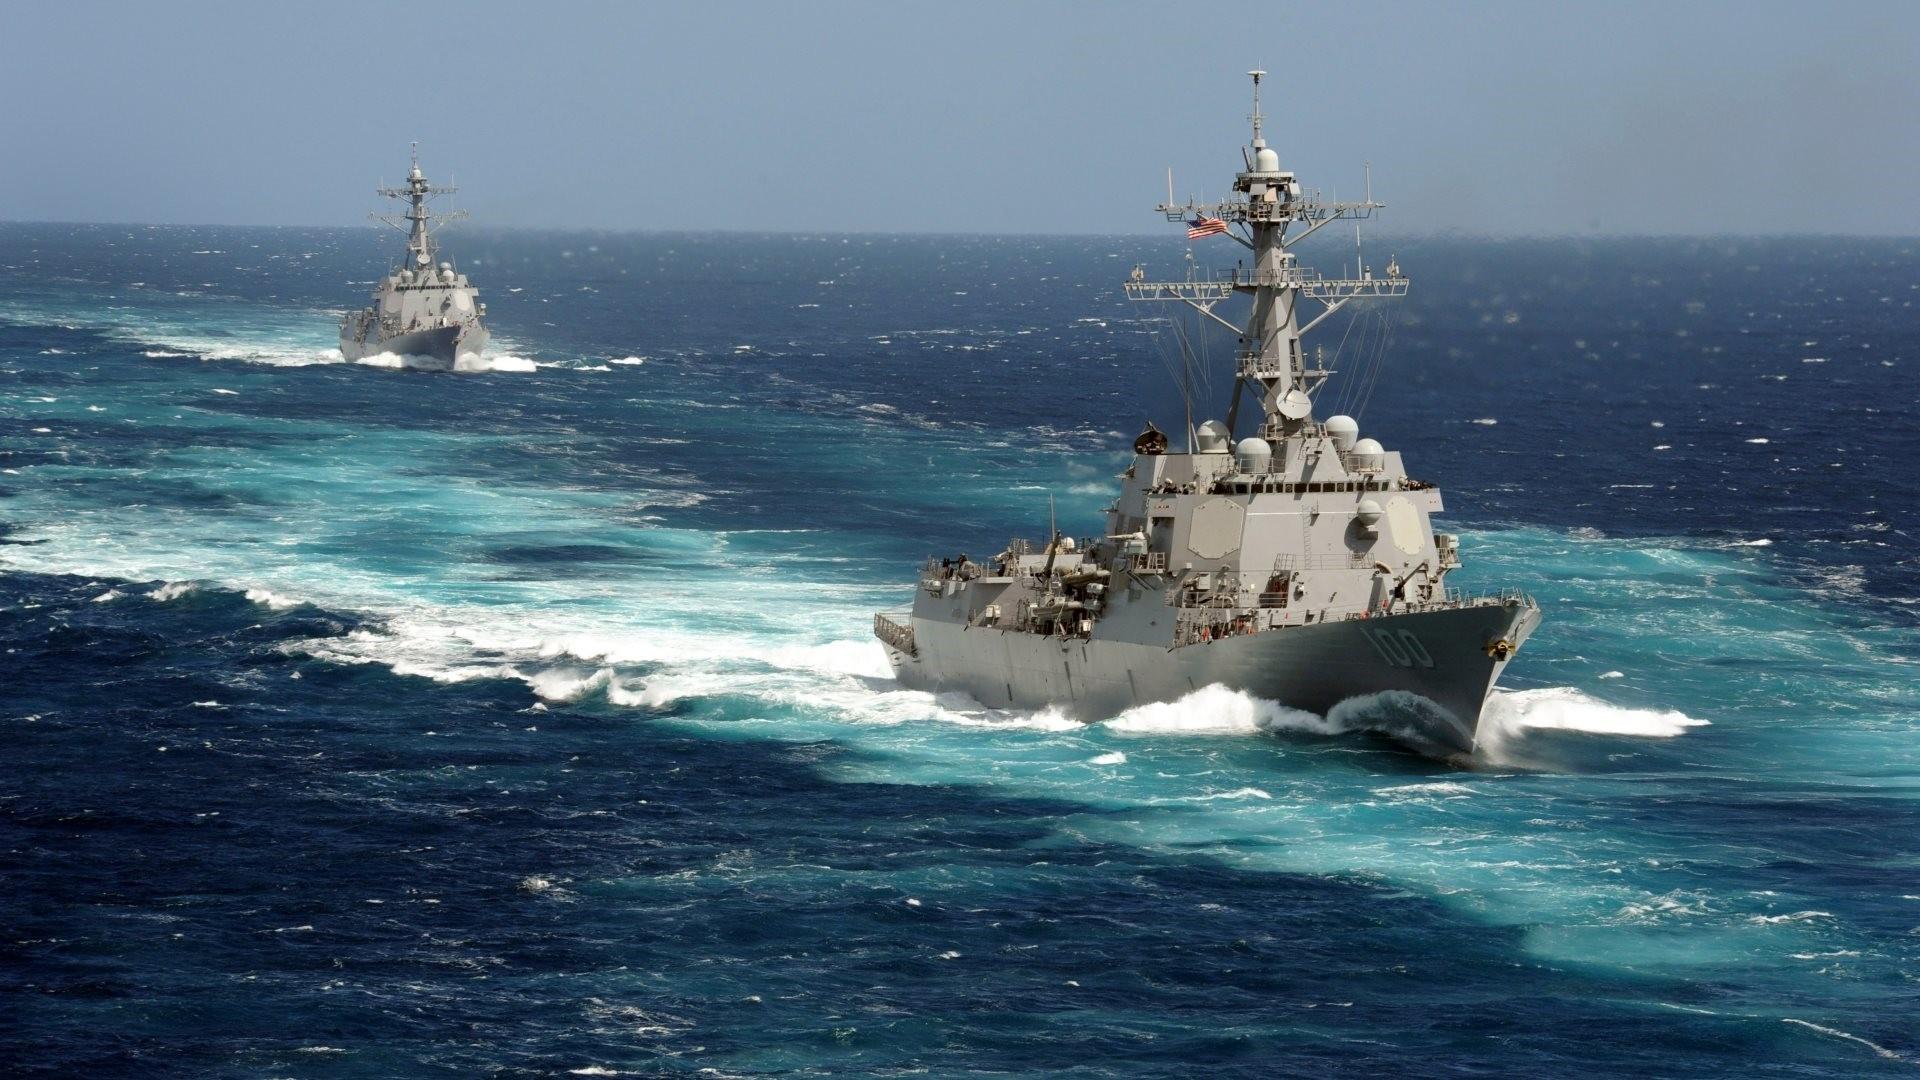 Us Navy hd wallpaper download